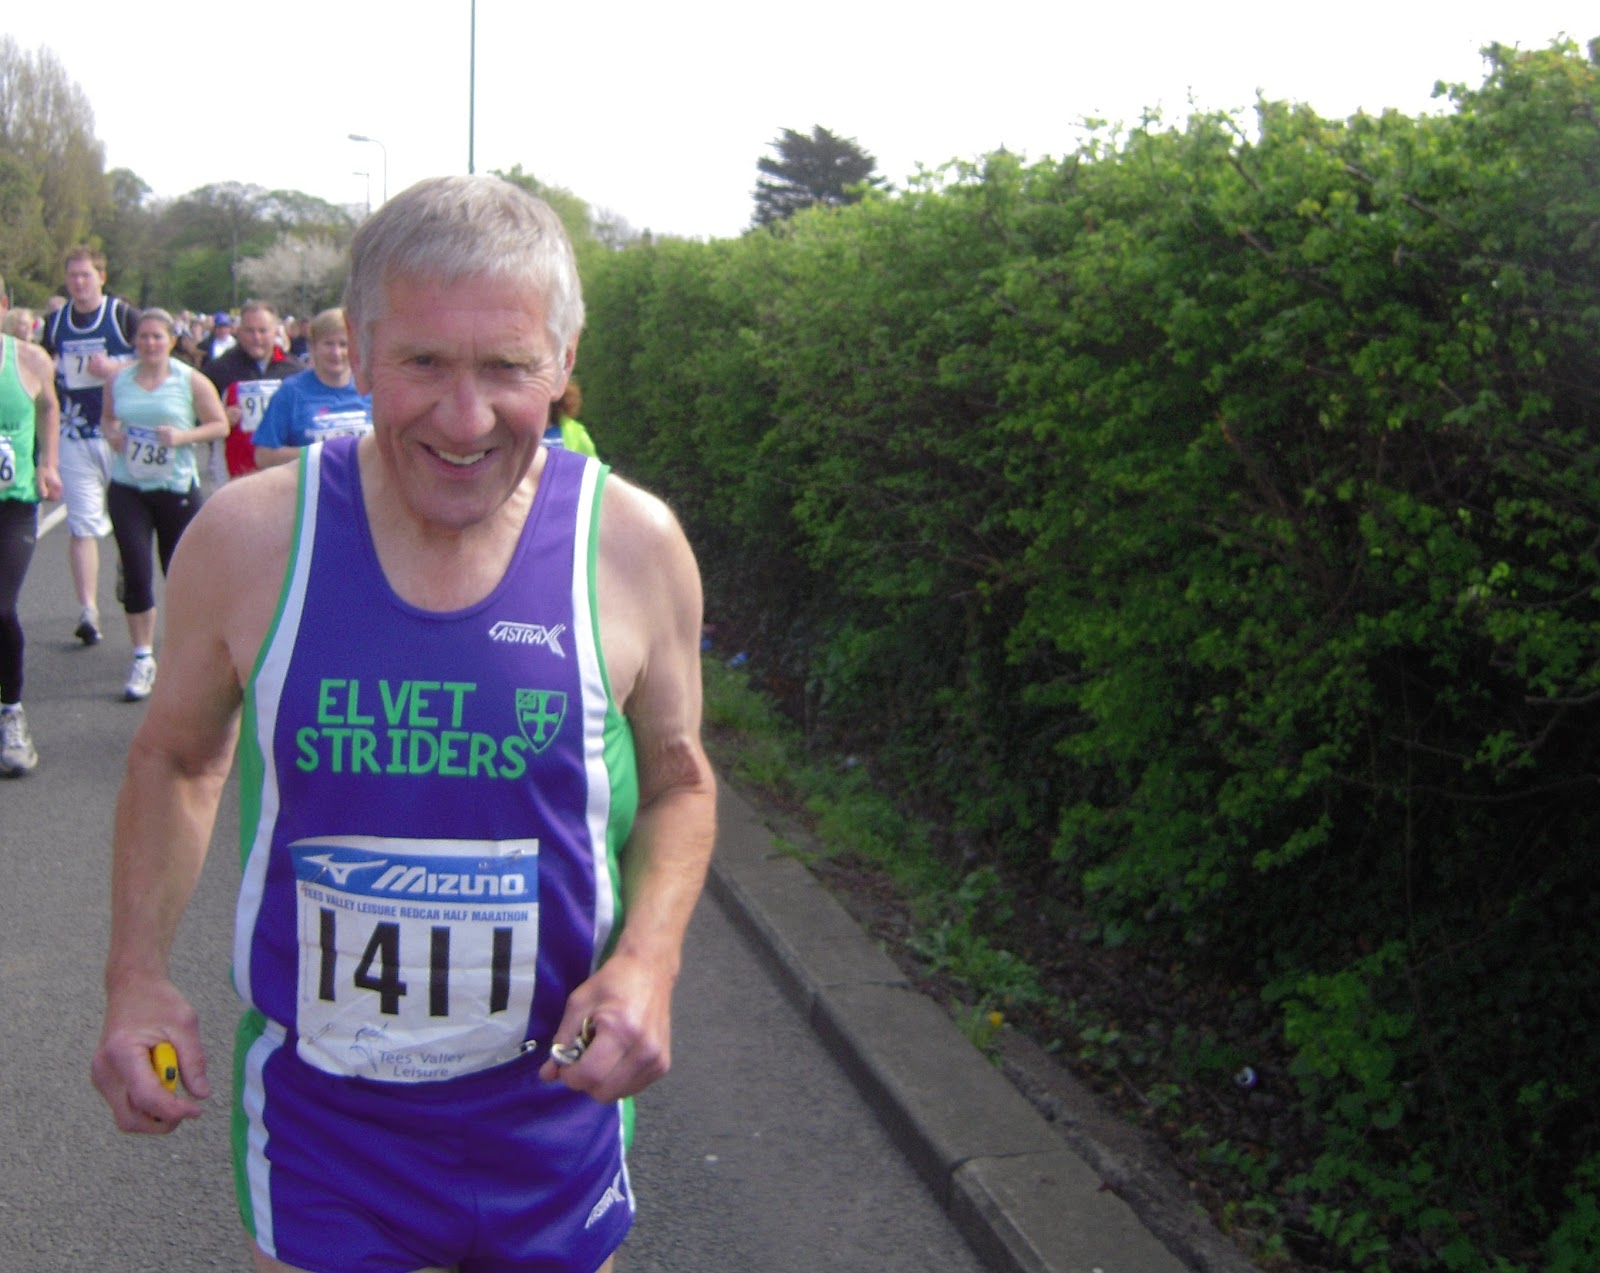 Redcar Half Marathon 2009 - 2009-04-19--09.37.57 (6) (Modified).jpg